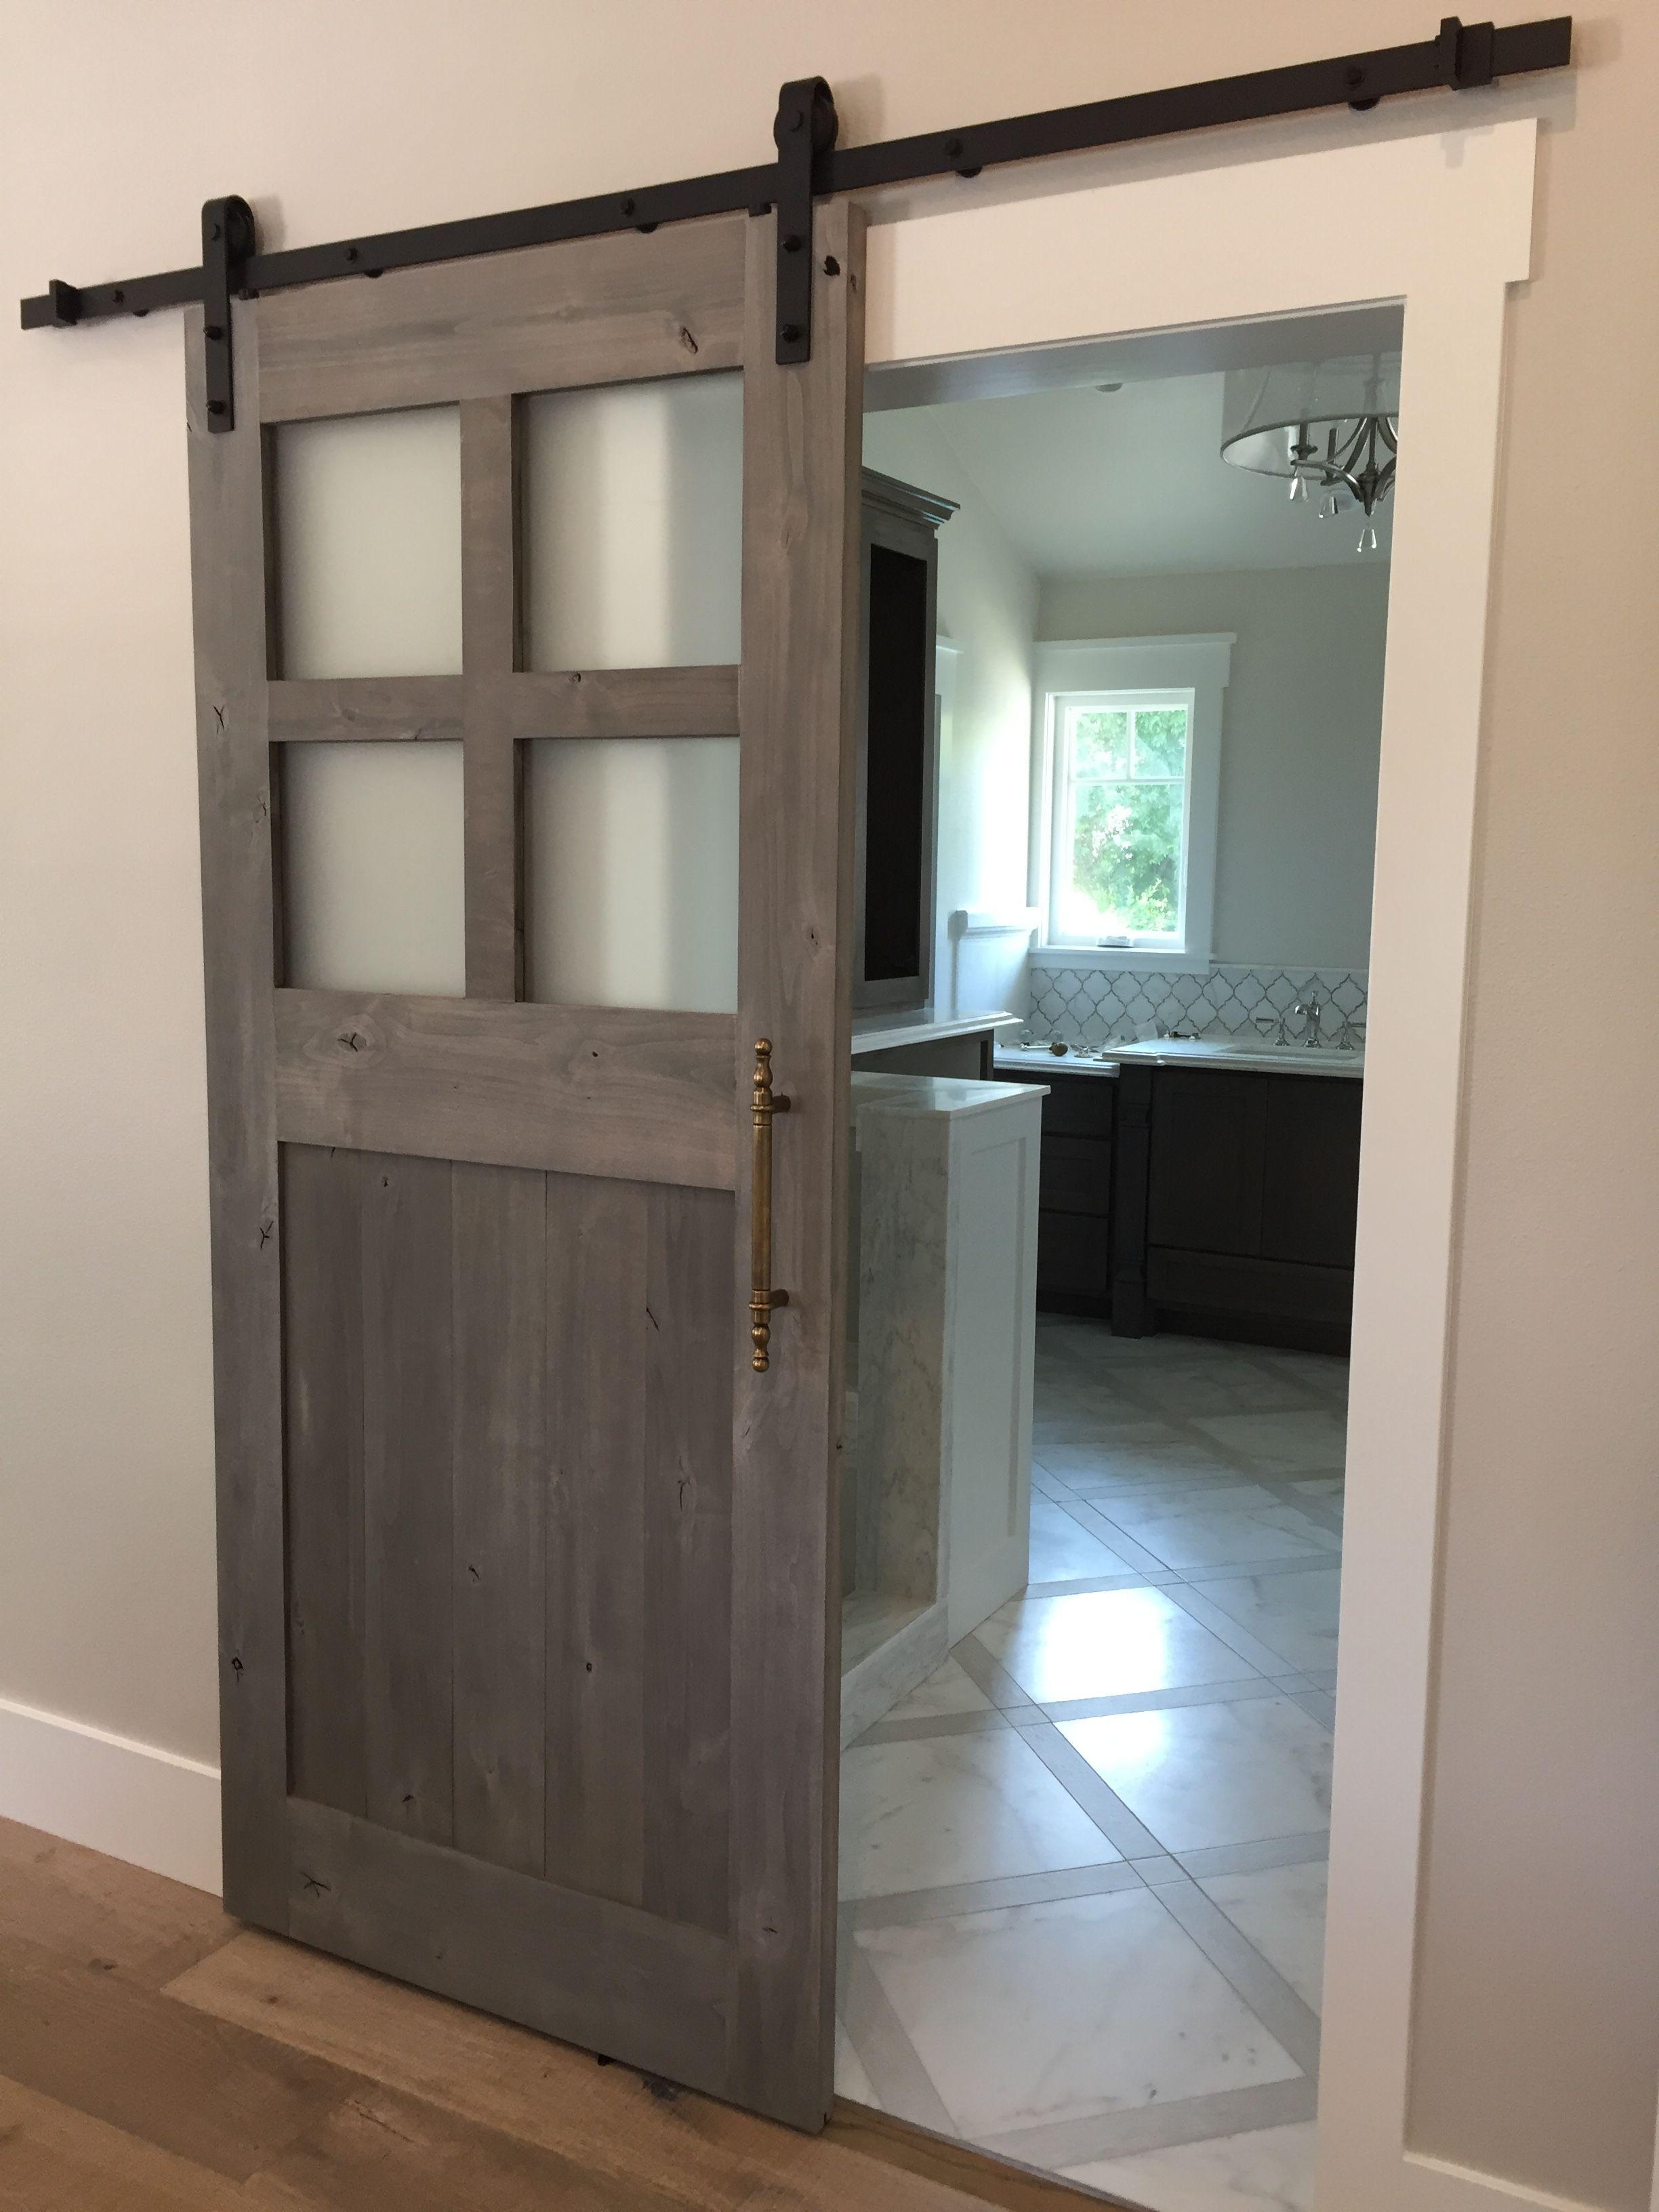 Bathroom Barn Door with glass | Barn Doors in 2019 | Glass